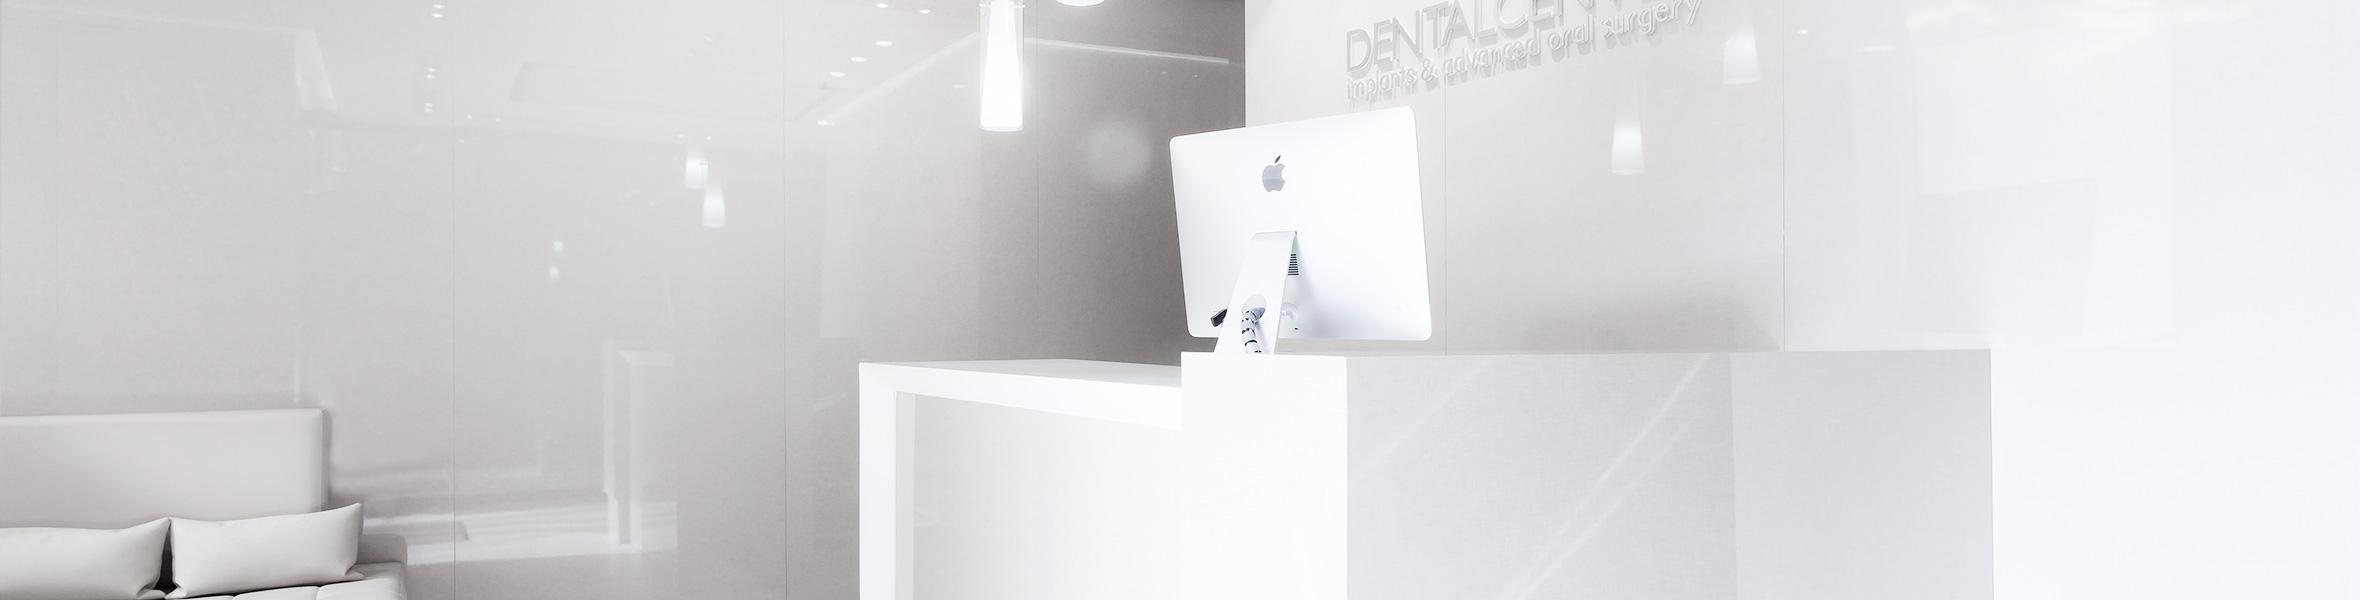 own dental clinics from dental center diparr